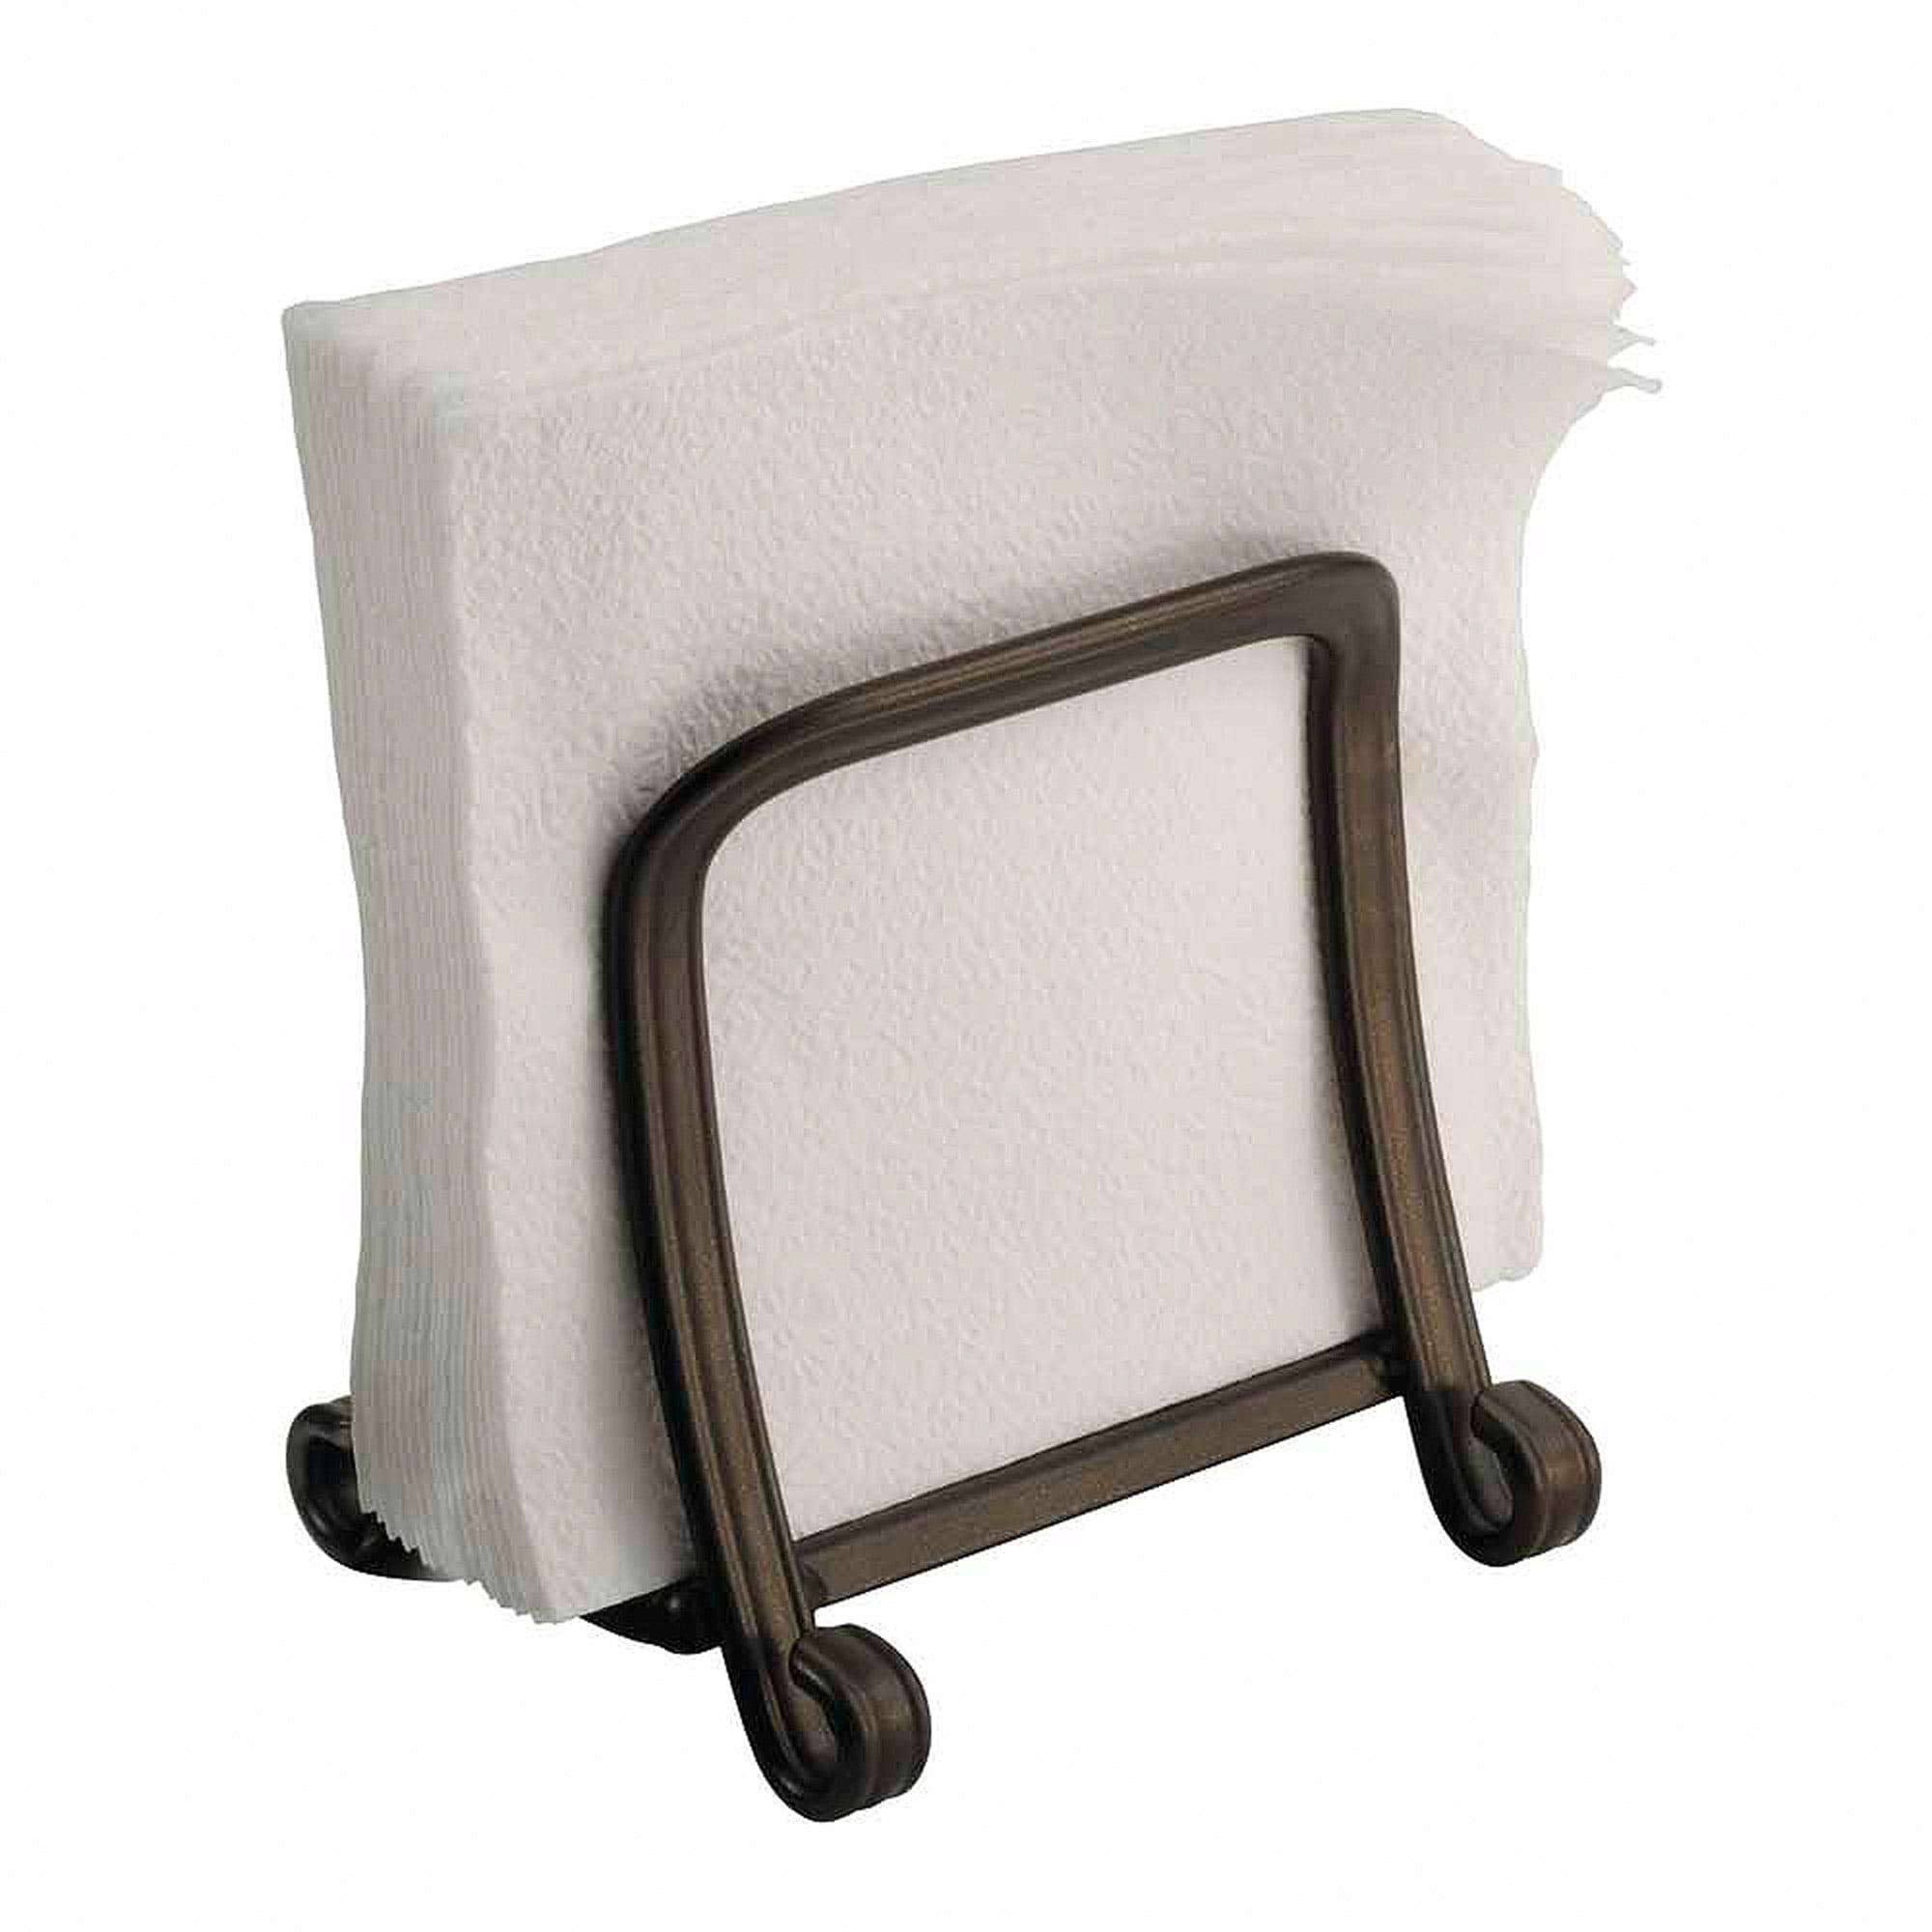 interdesign york houseware grip napkin holder for kitchen countertops table bronze walmartcom